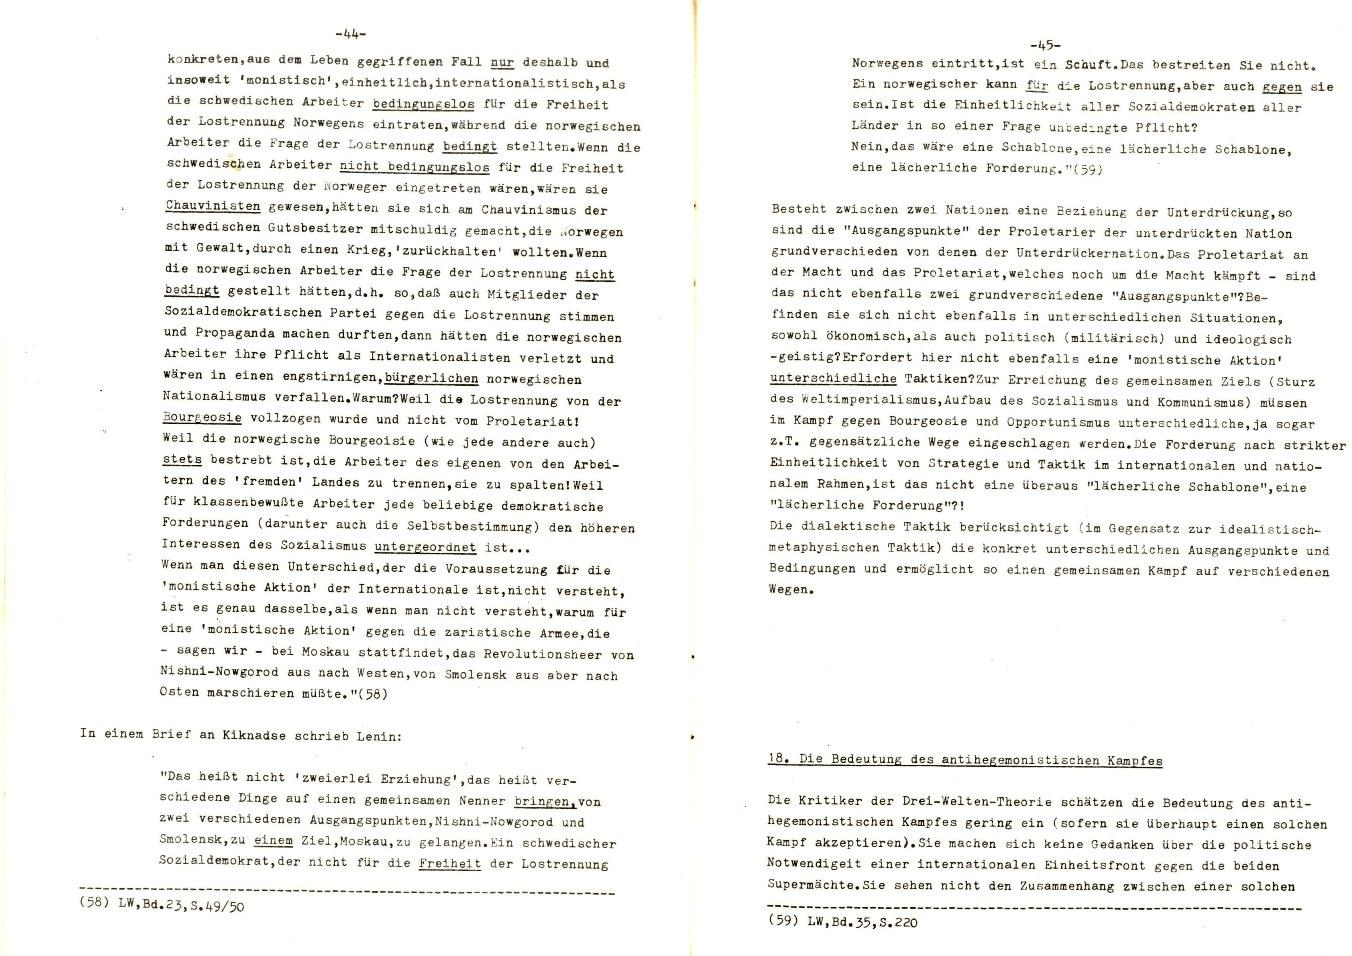 Muenchen_Kampf_dem_Revisionismus_1978_04_05_24